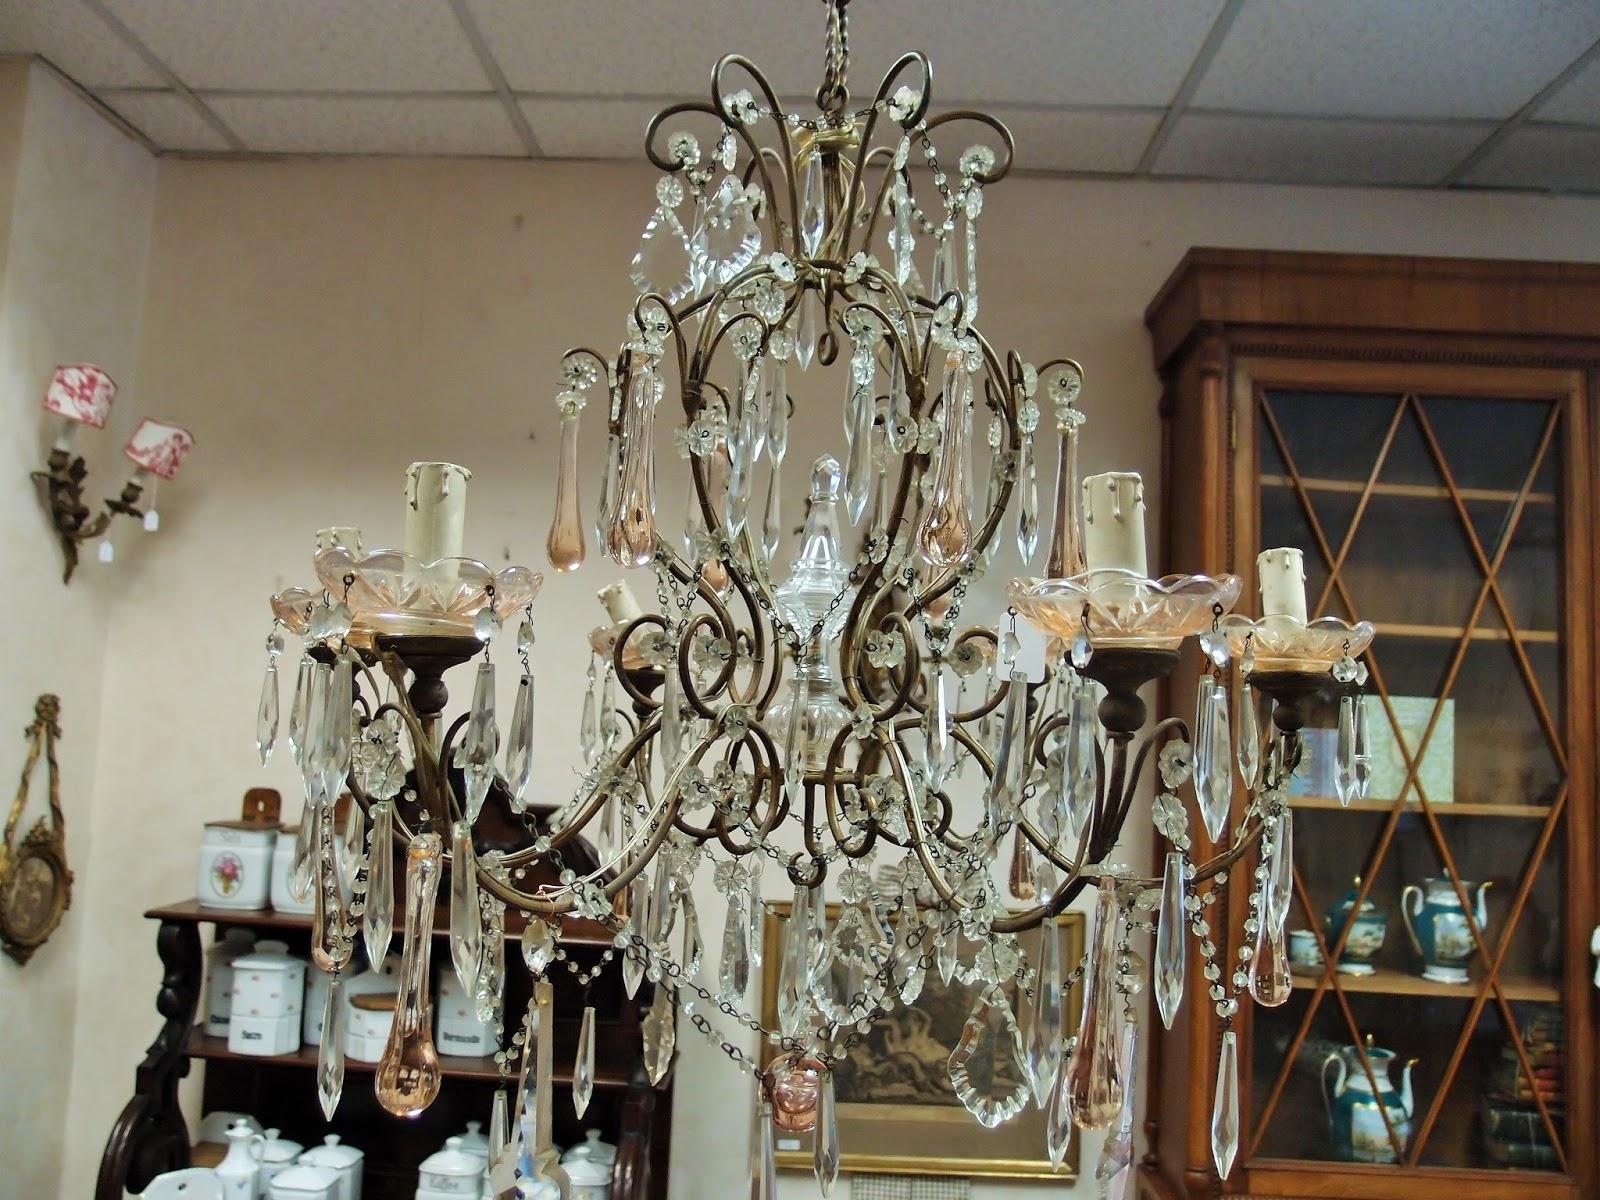 Lampadari antichi : luci romantiche per arredi moderni   Antichità